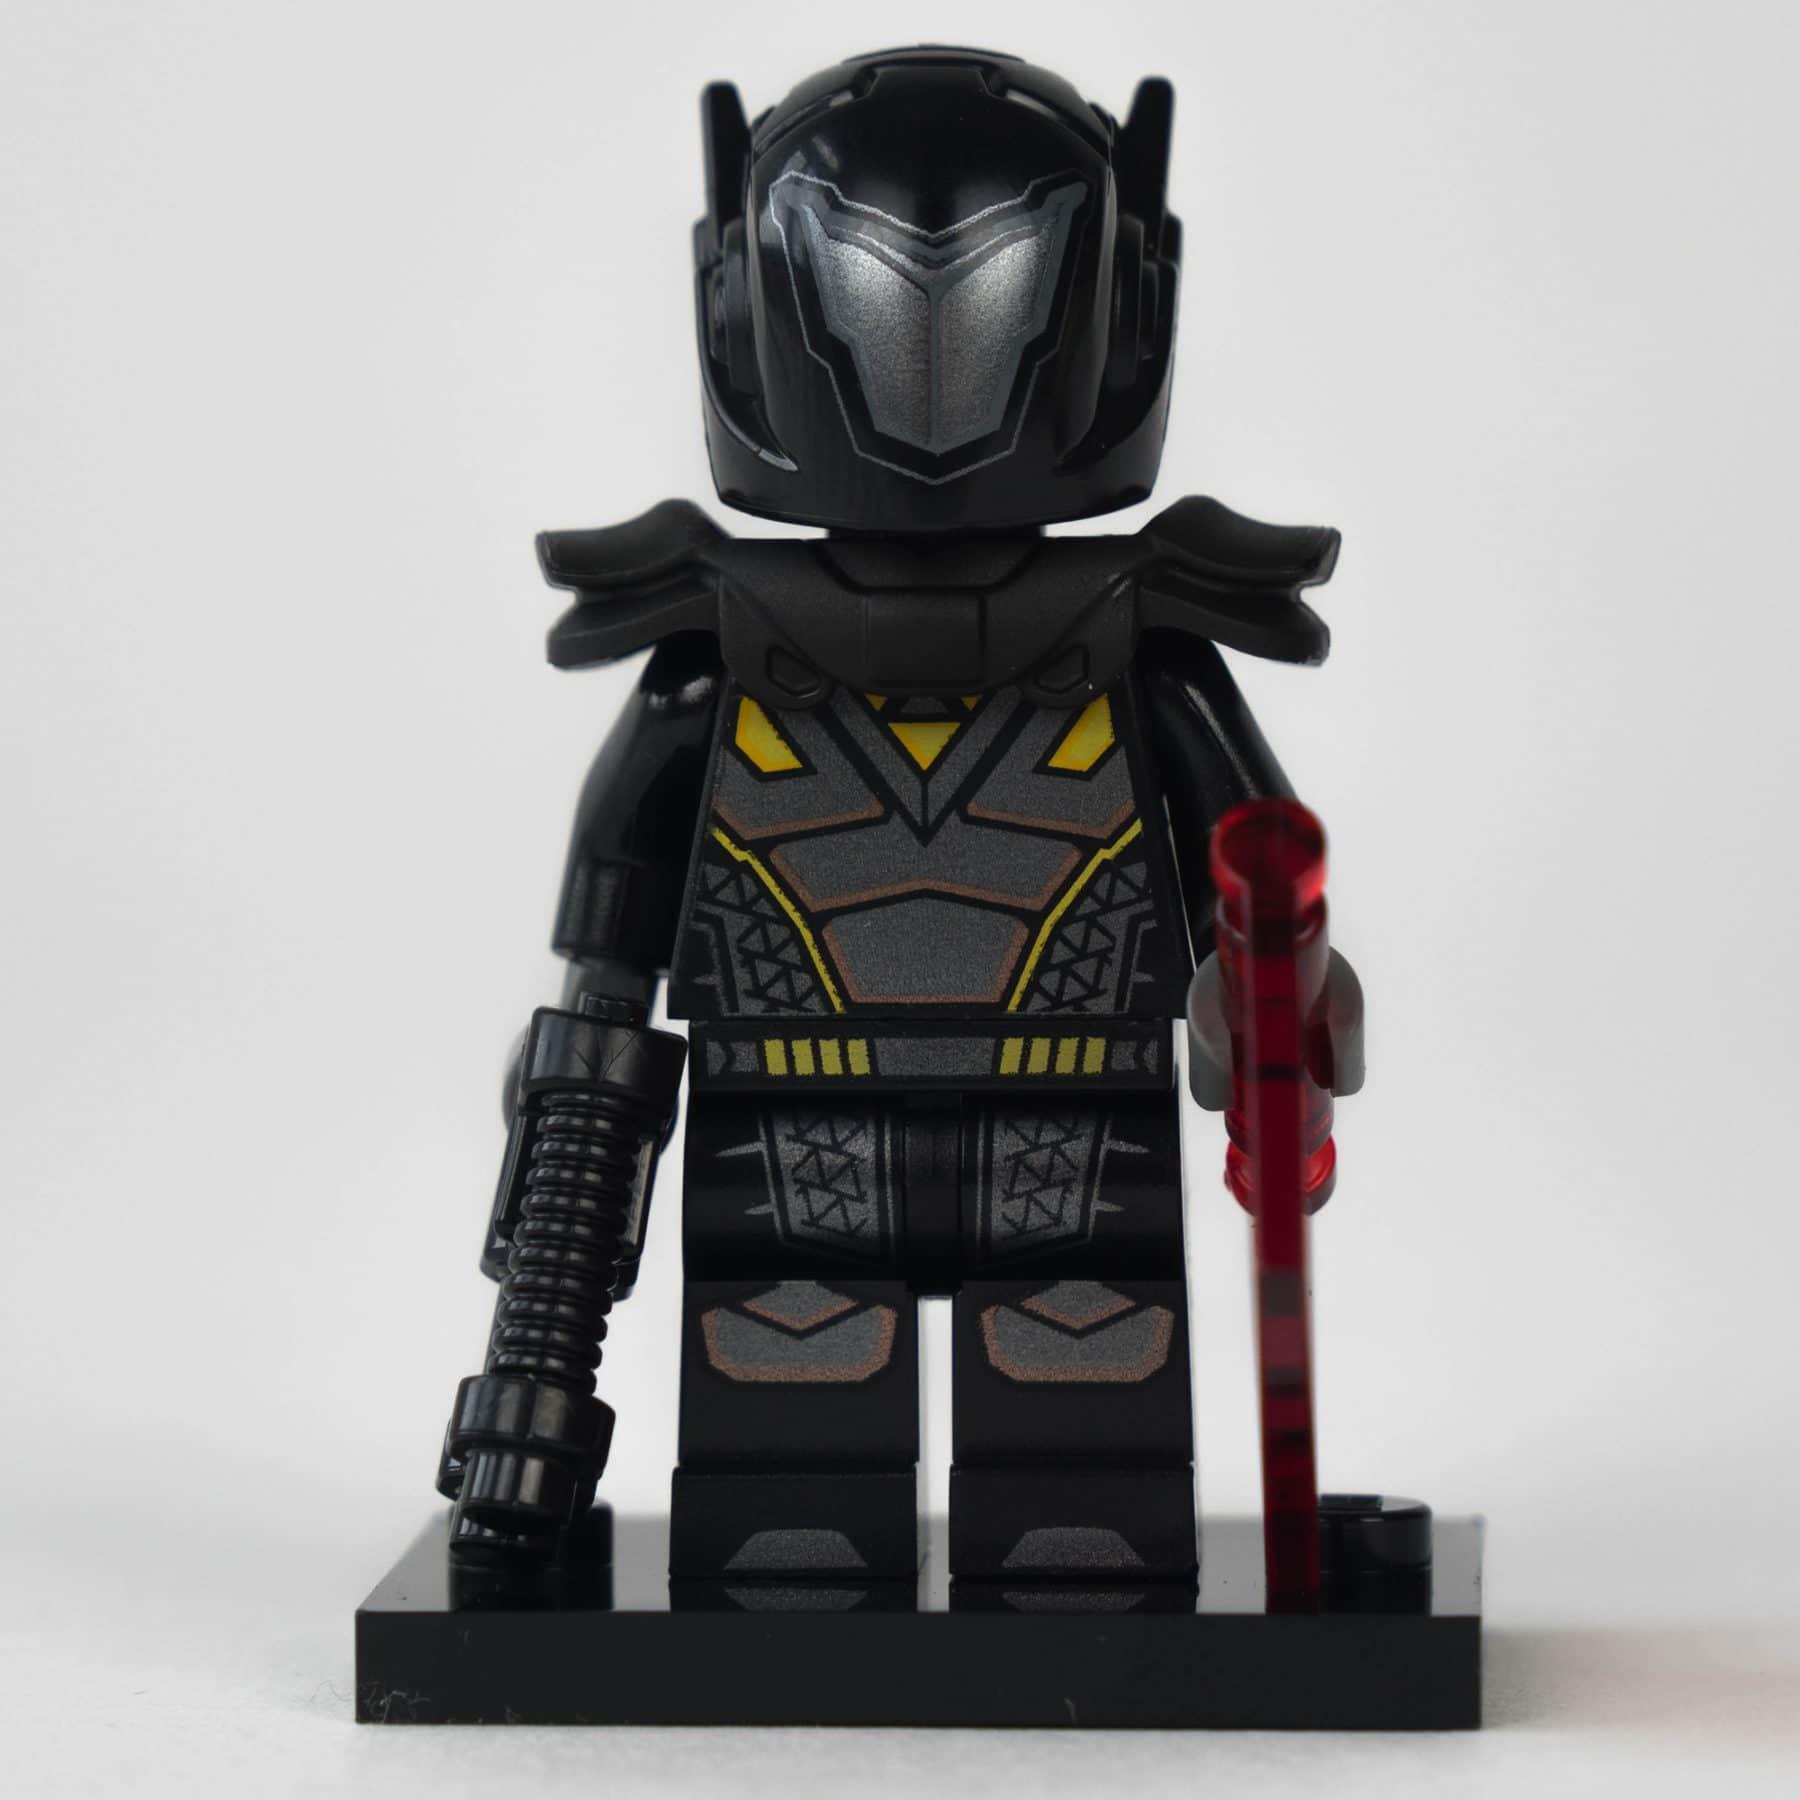 LEGO 71025 Minifigur: Kopfgeldjäger